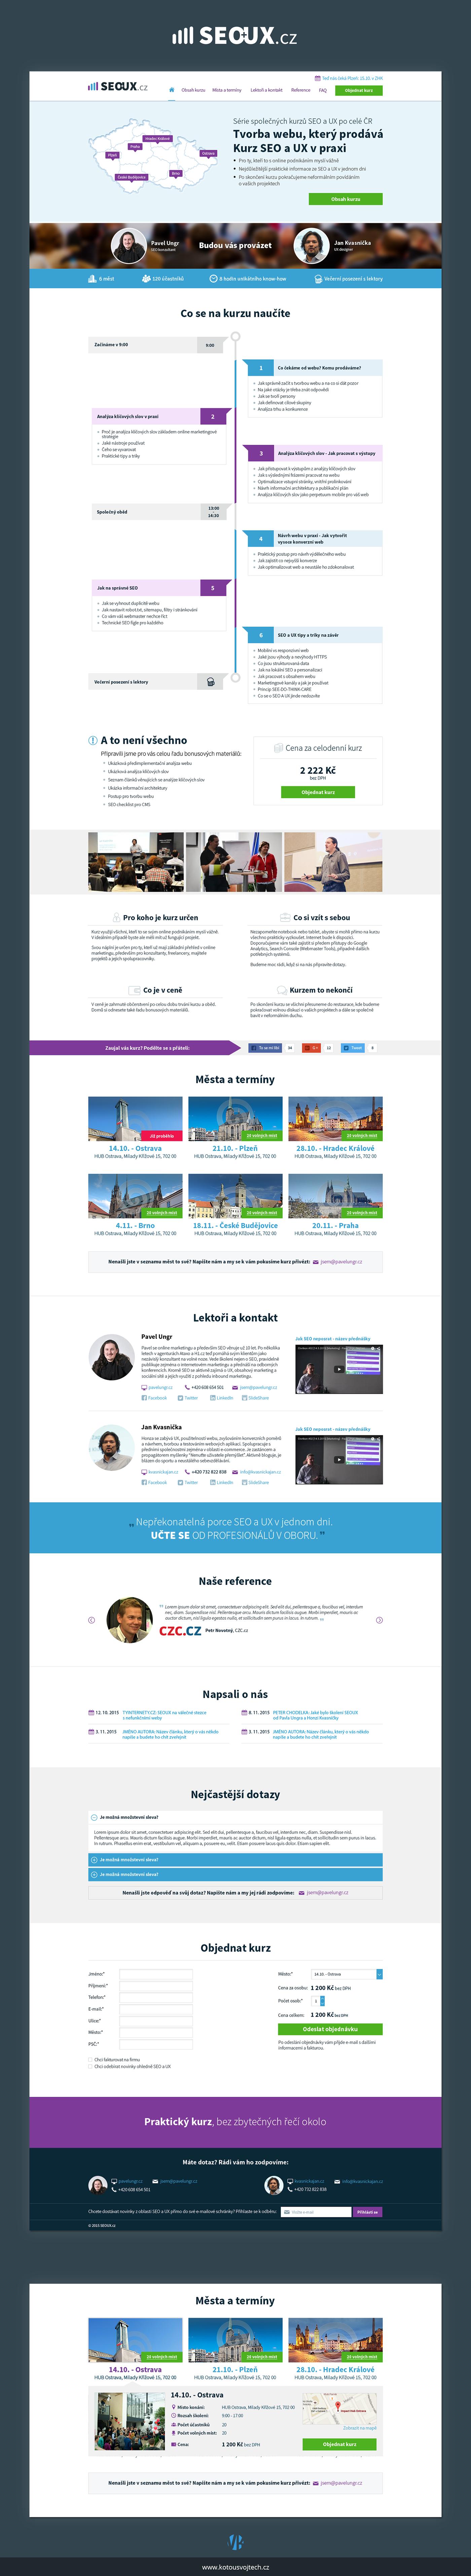 Webdesign ux SEO